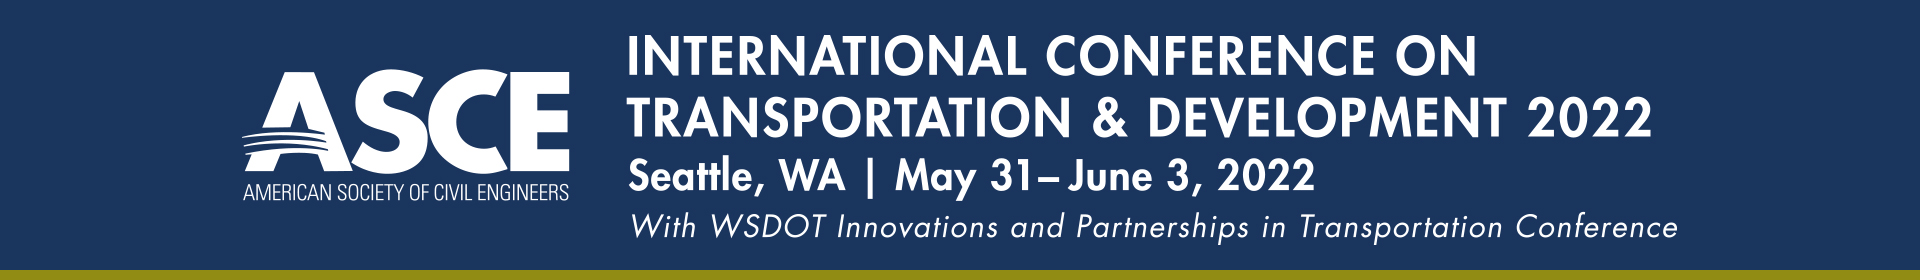 ICTD 2022 Event Banner